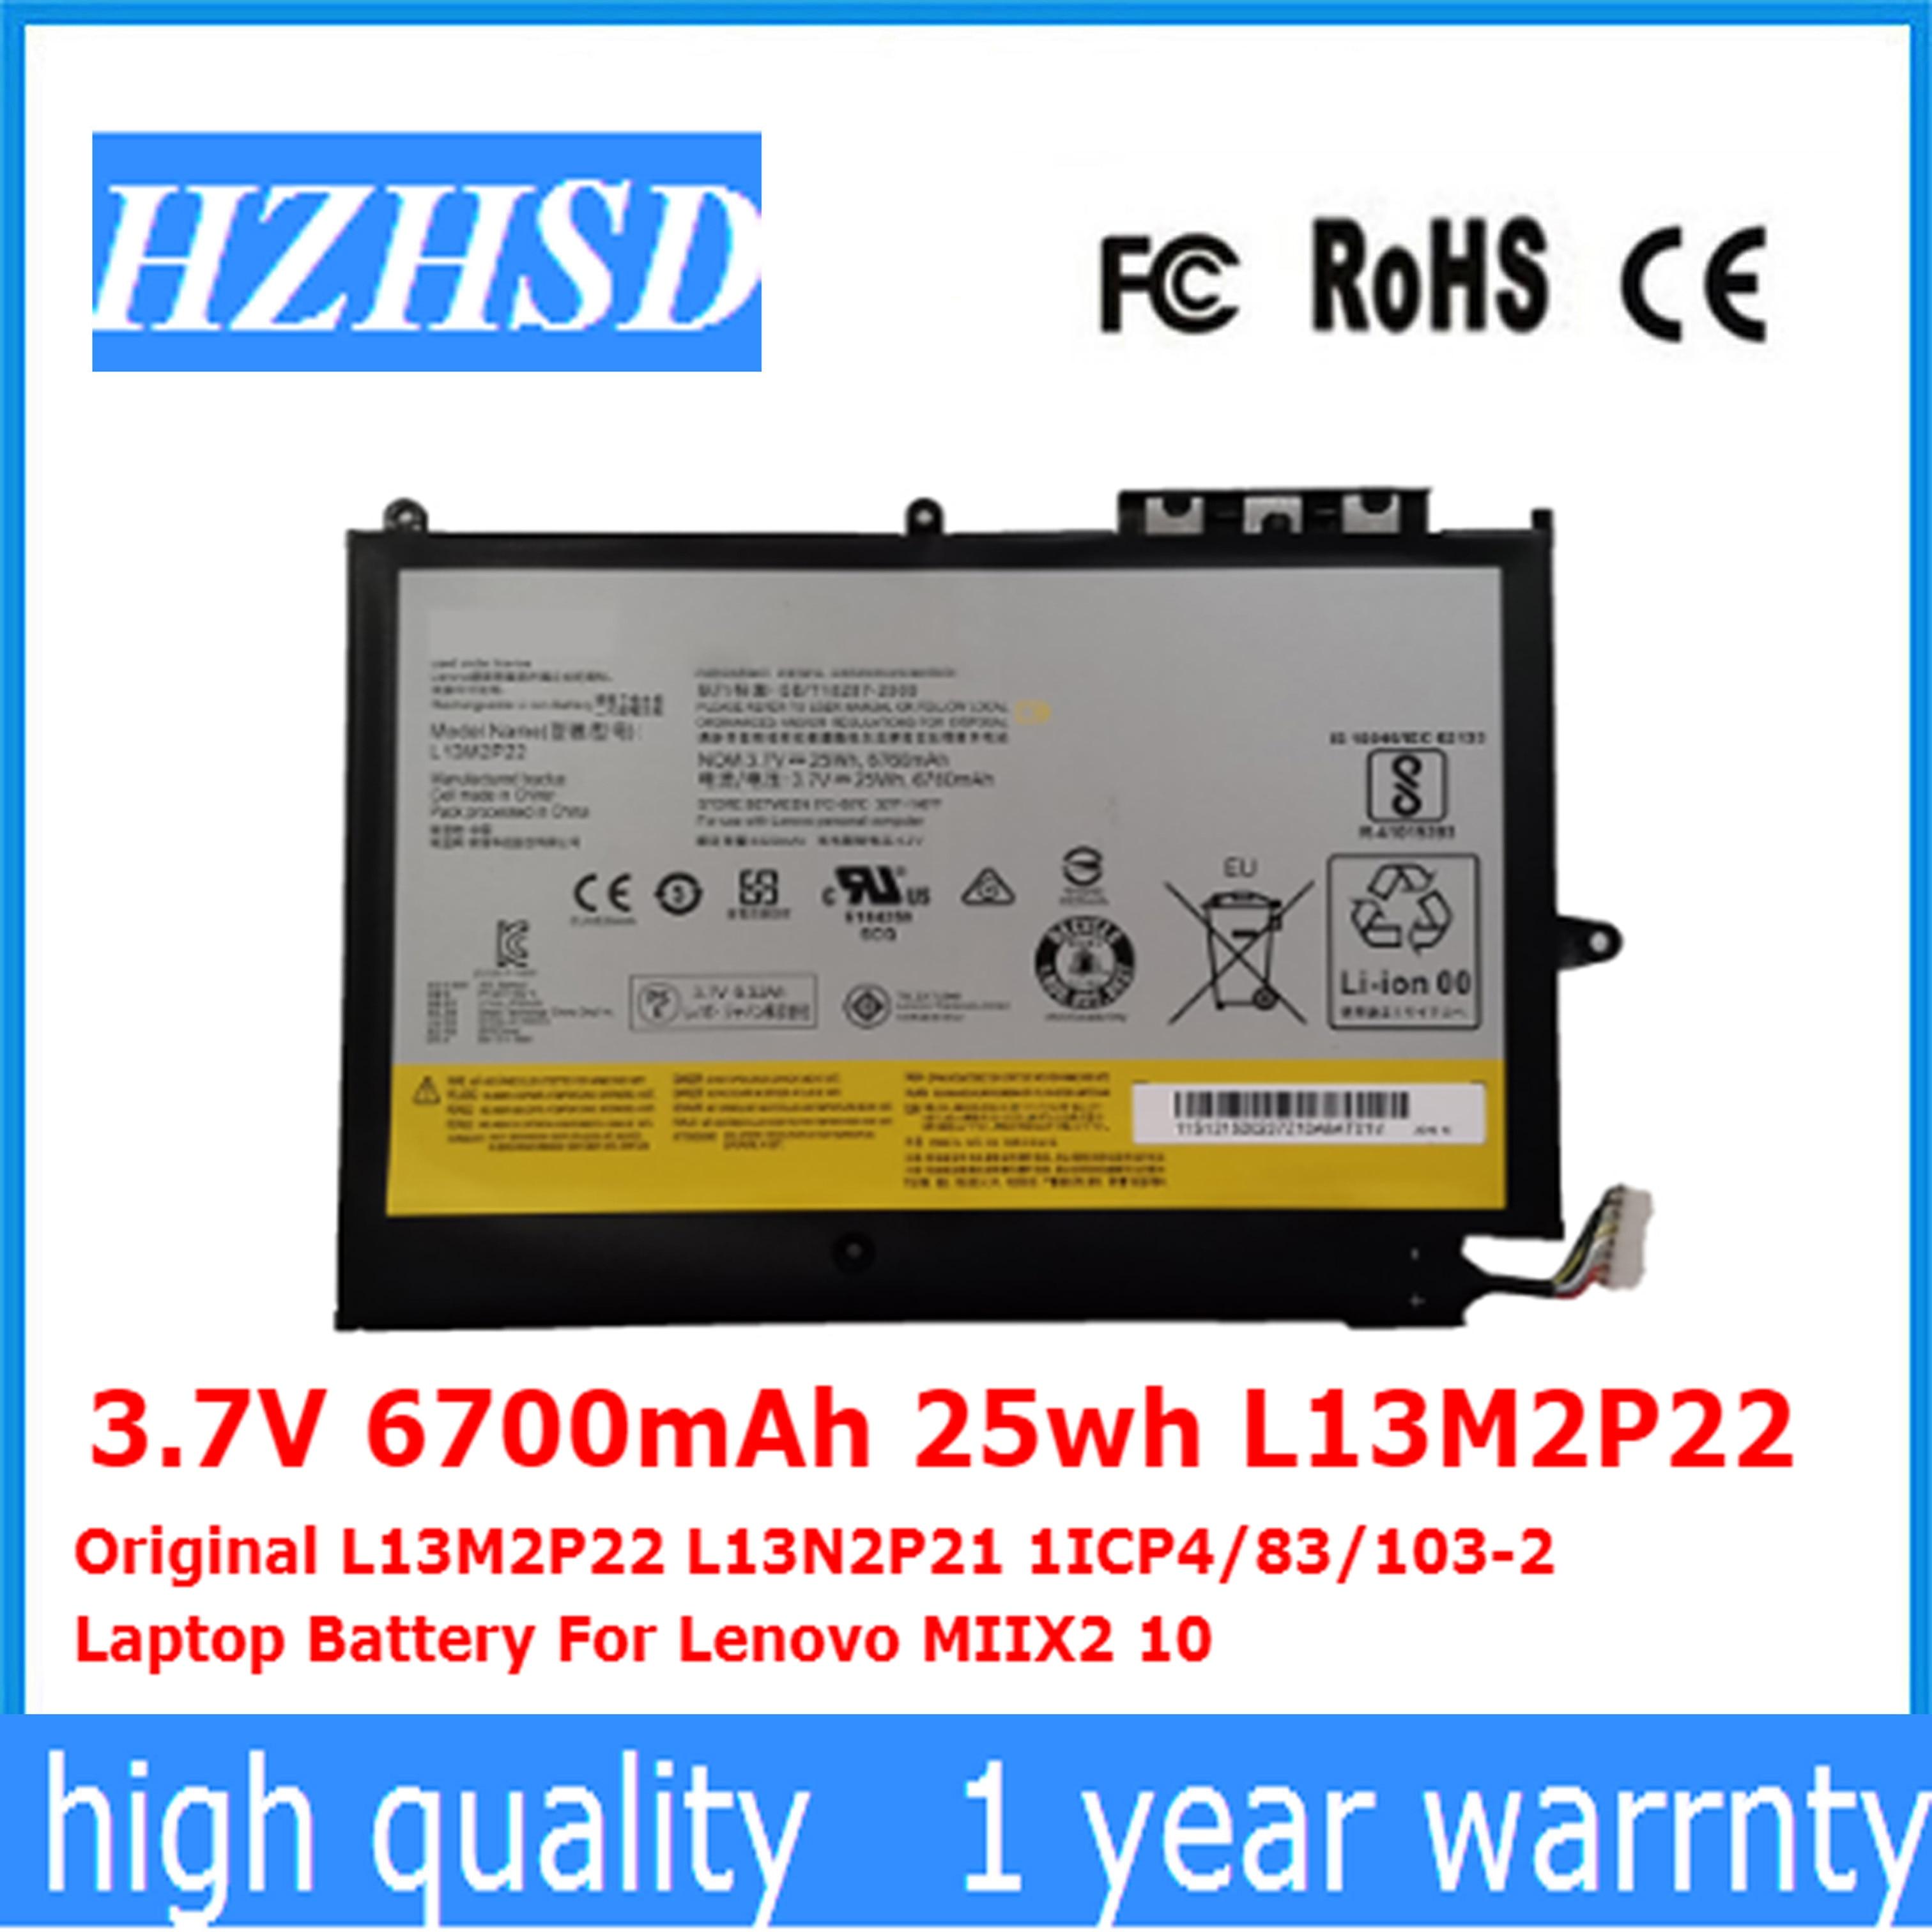 3.7V 6700mAh 25wh L13M2P22 Original L13M2P22 L13N2P21 1ICP4/83/103-2 Laptop Battery For Lenovo MIIX2 10